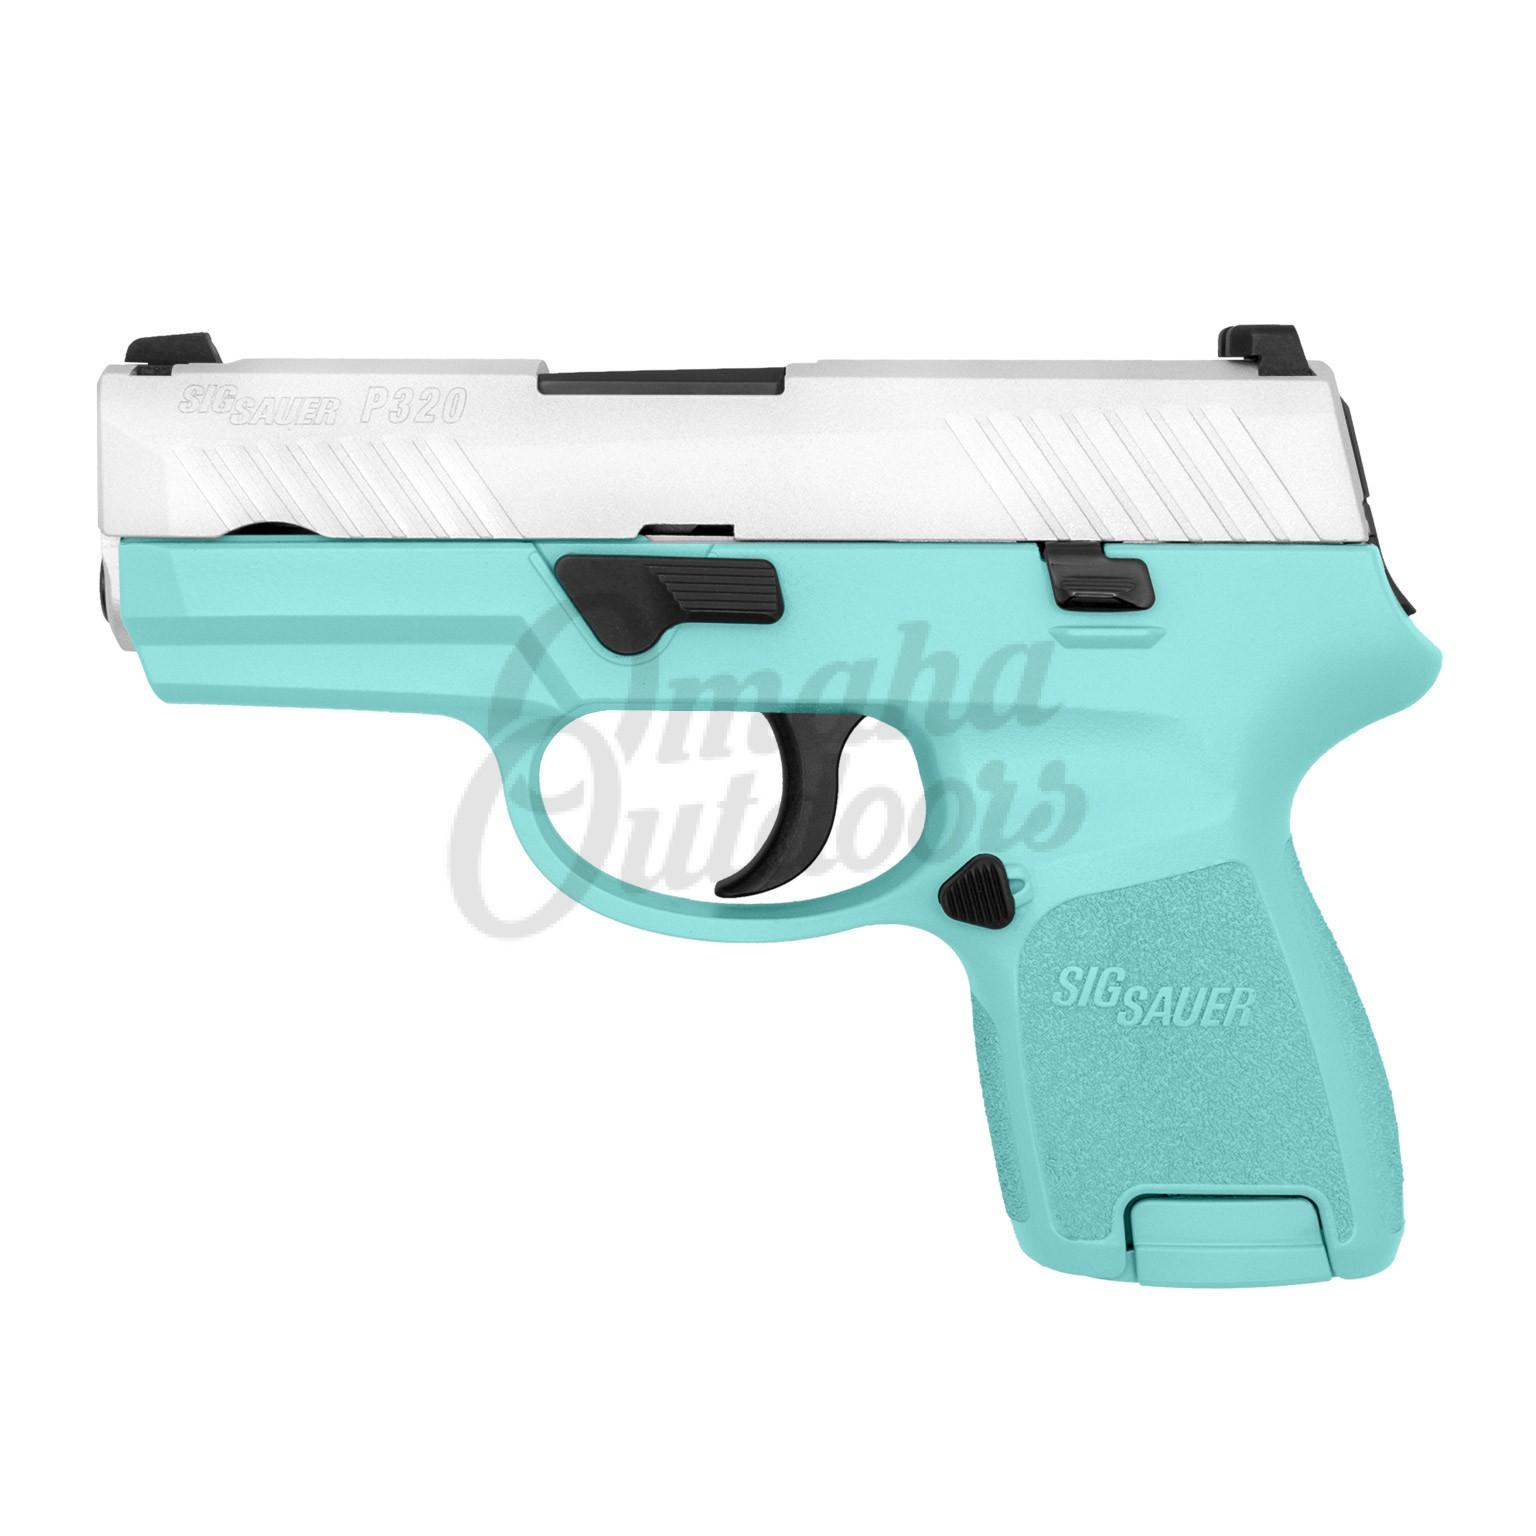 Sig Sauer P320 Subcompact Vera Blue Pistol 12 RD 9mm Satin